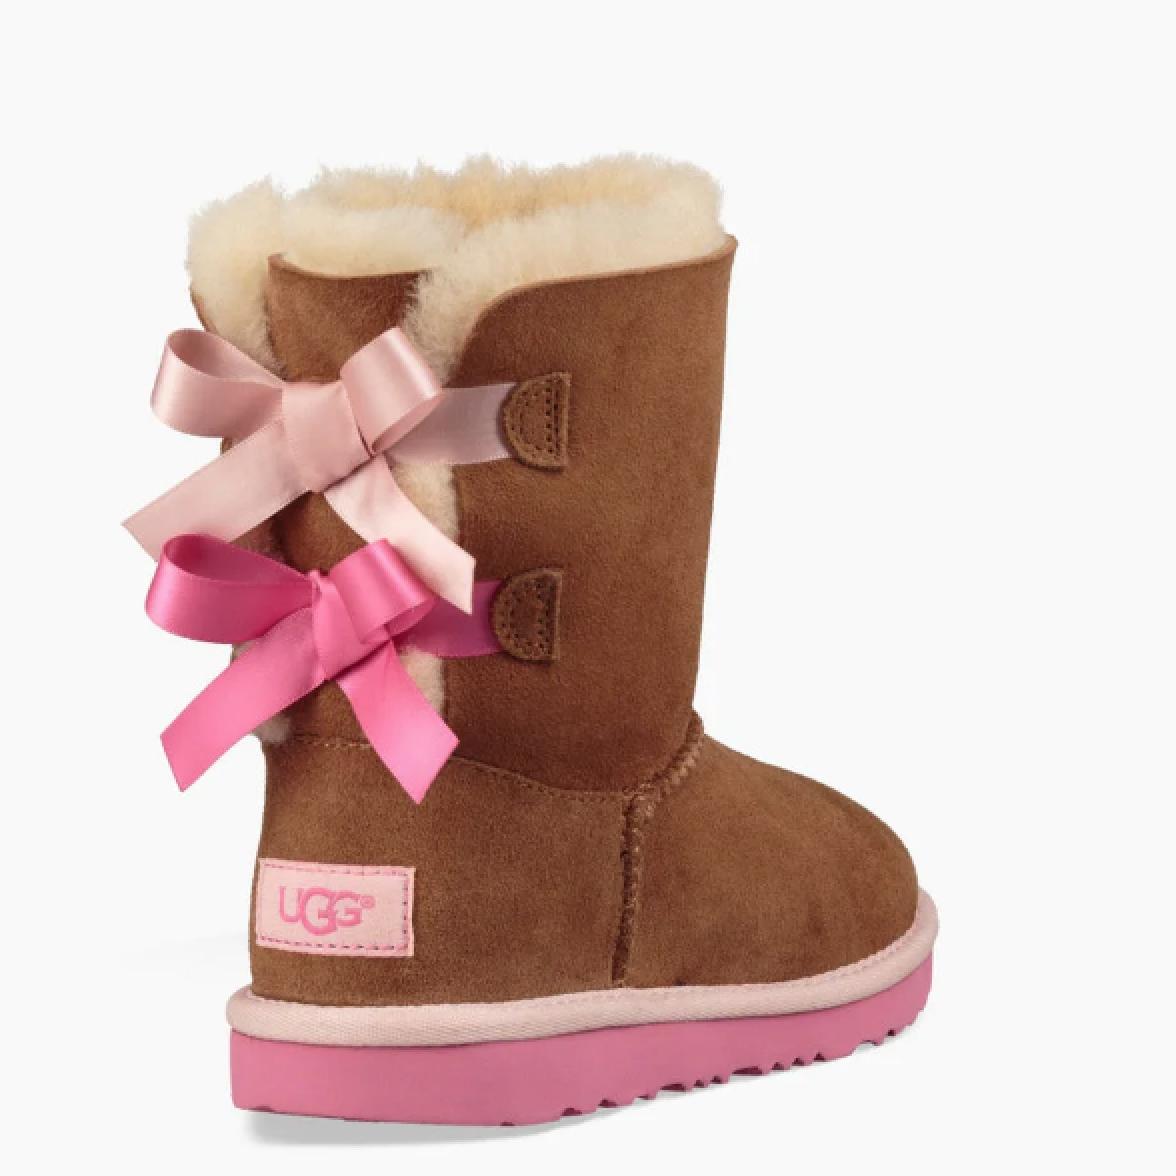 Ugg Bailey Bow II Kid's ChestnutPink Azalea Boot